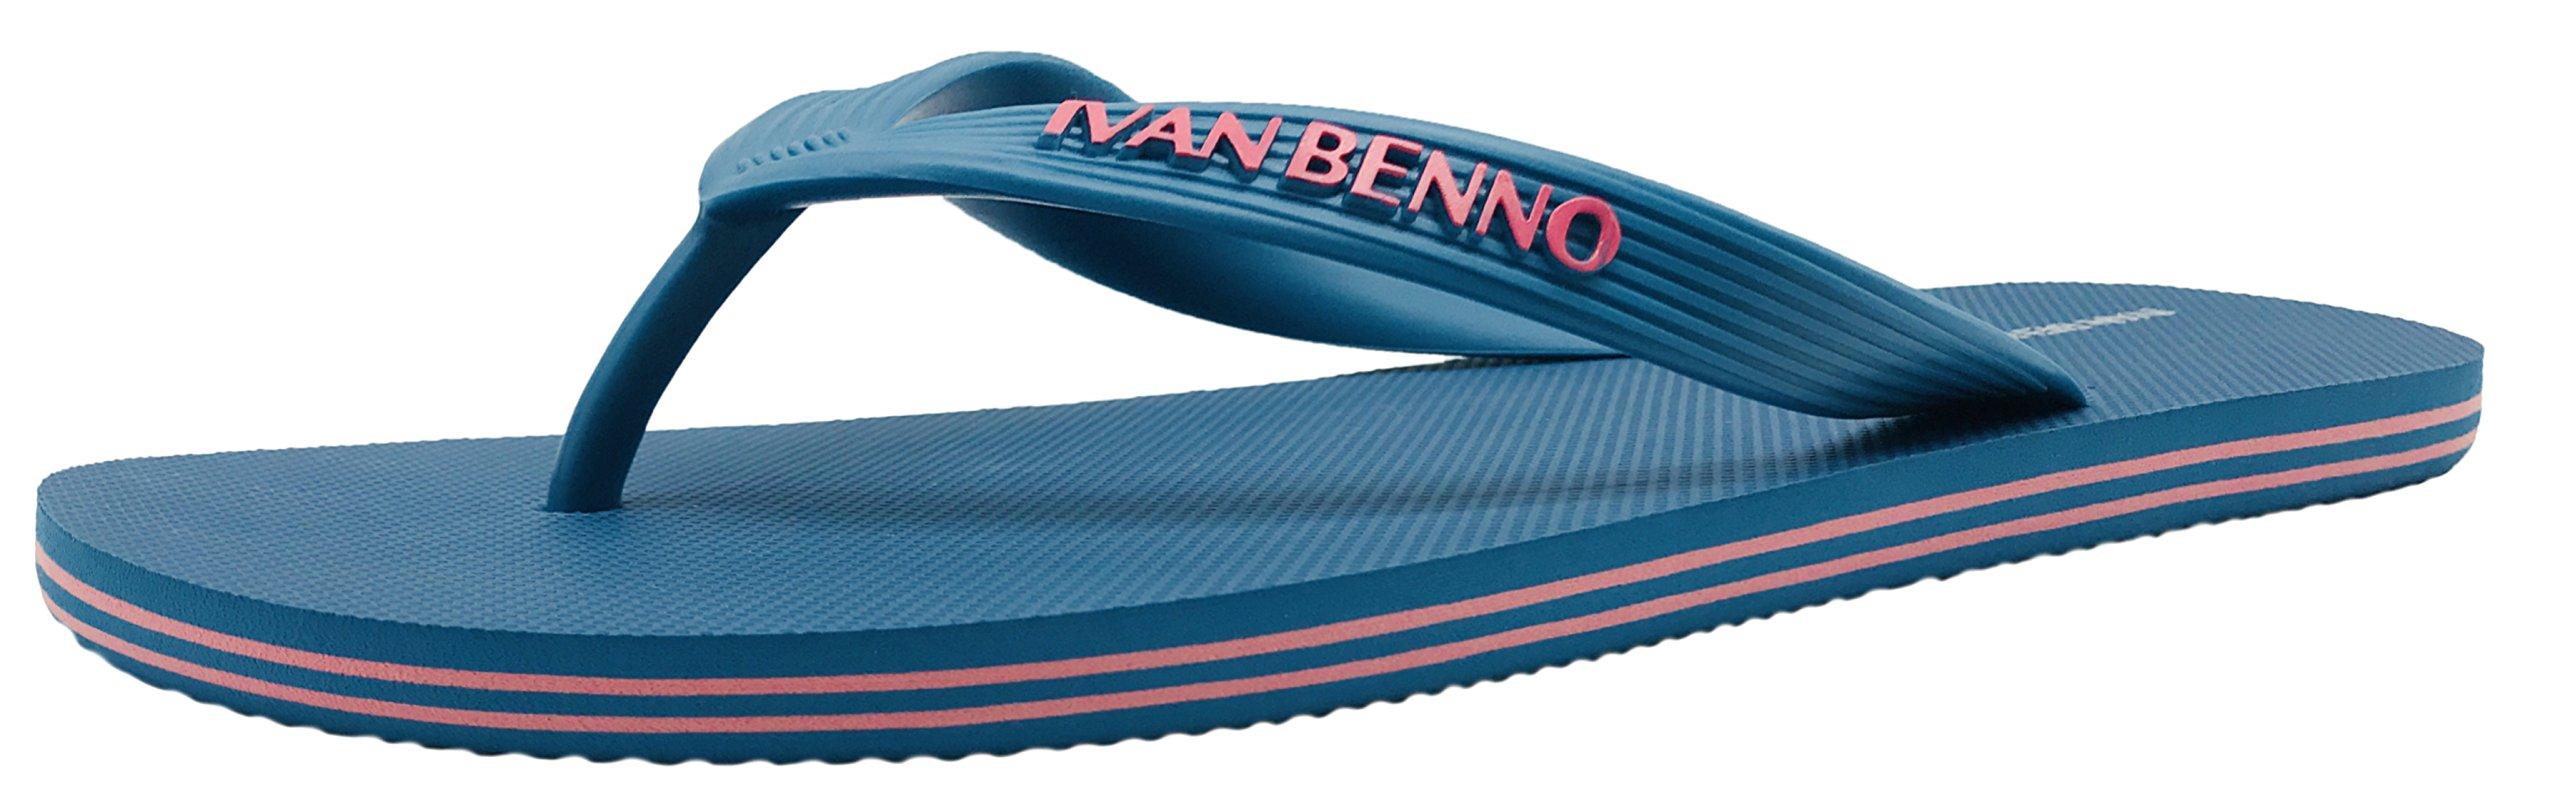 Finoceans Mens Flip Flops Tong Comfort Beach Athletic Sandals Slipper Shoes